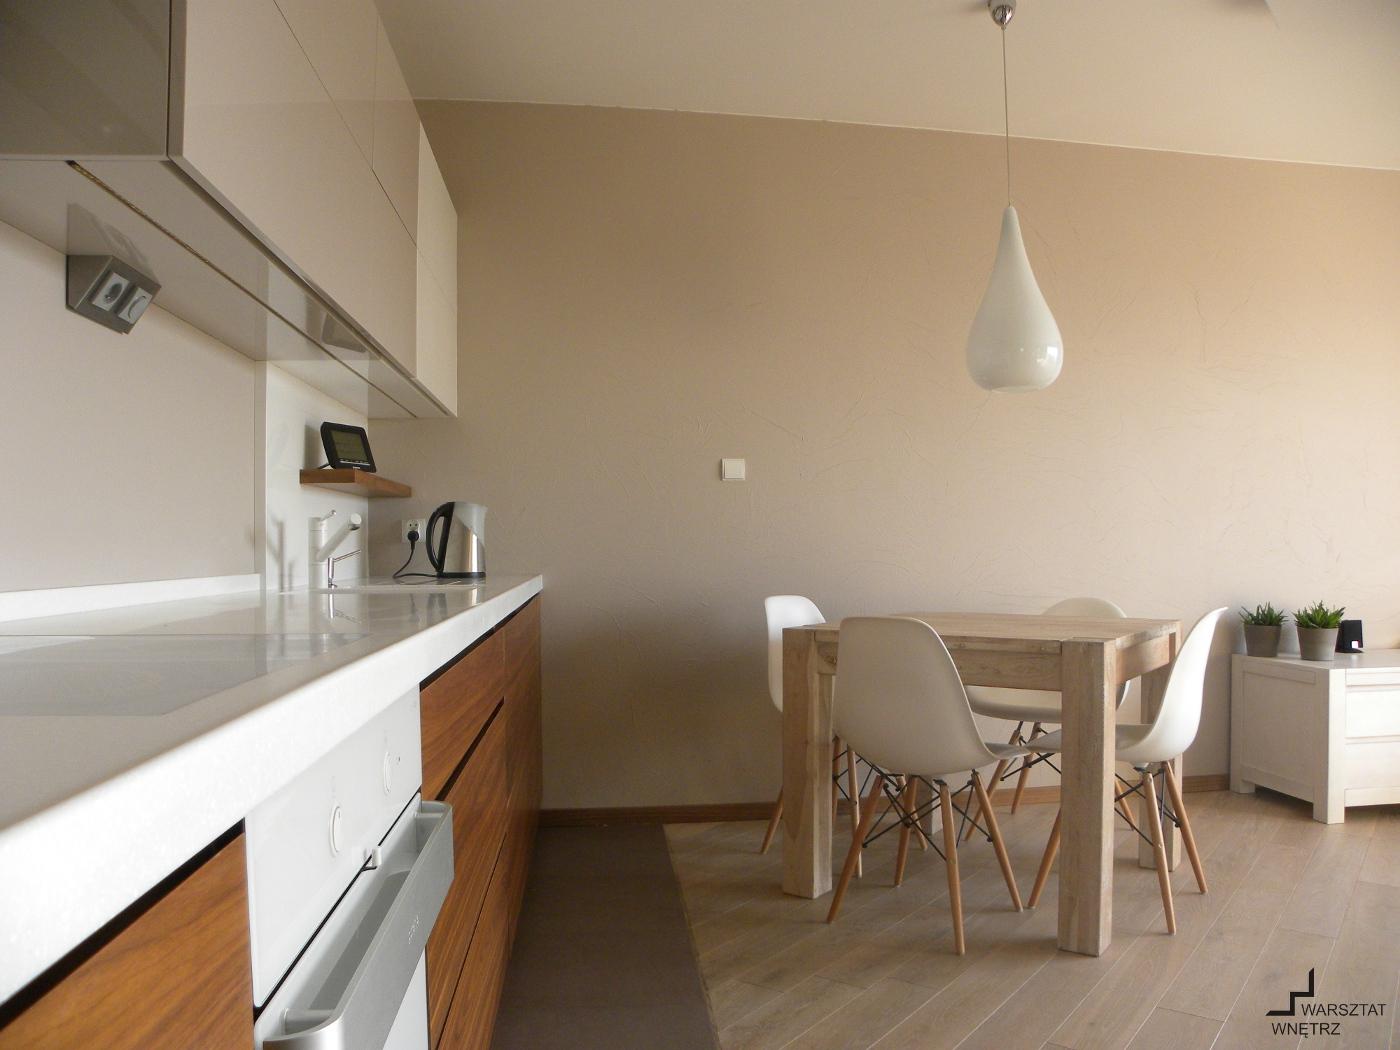 salon z aneksem kuchennym w stonowanej kolorystyce warsztat wn trz. Black Bedroom Furniture Sets. Home Design Ideas